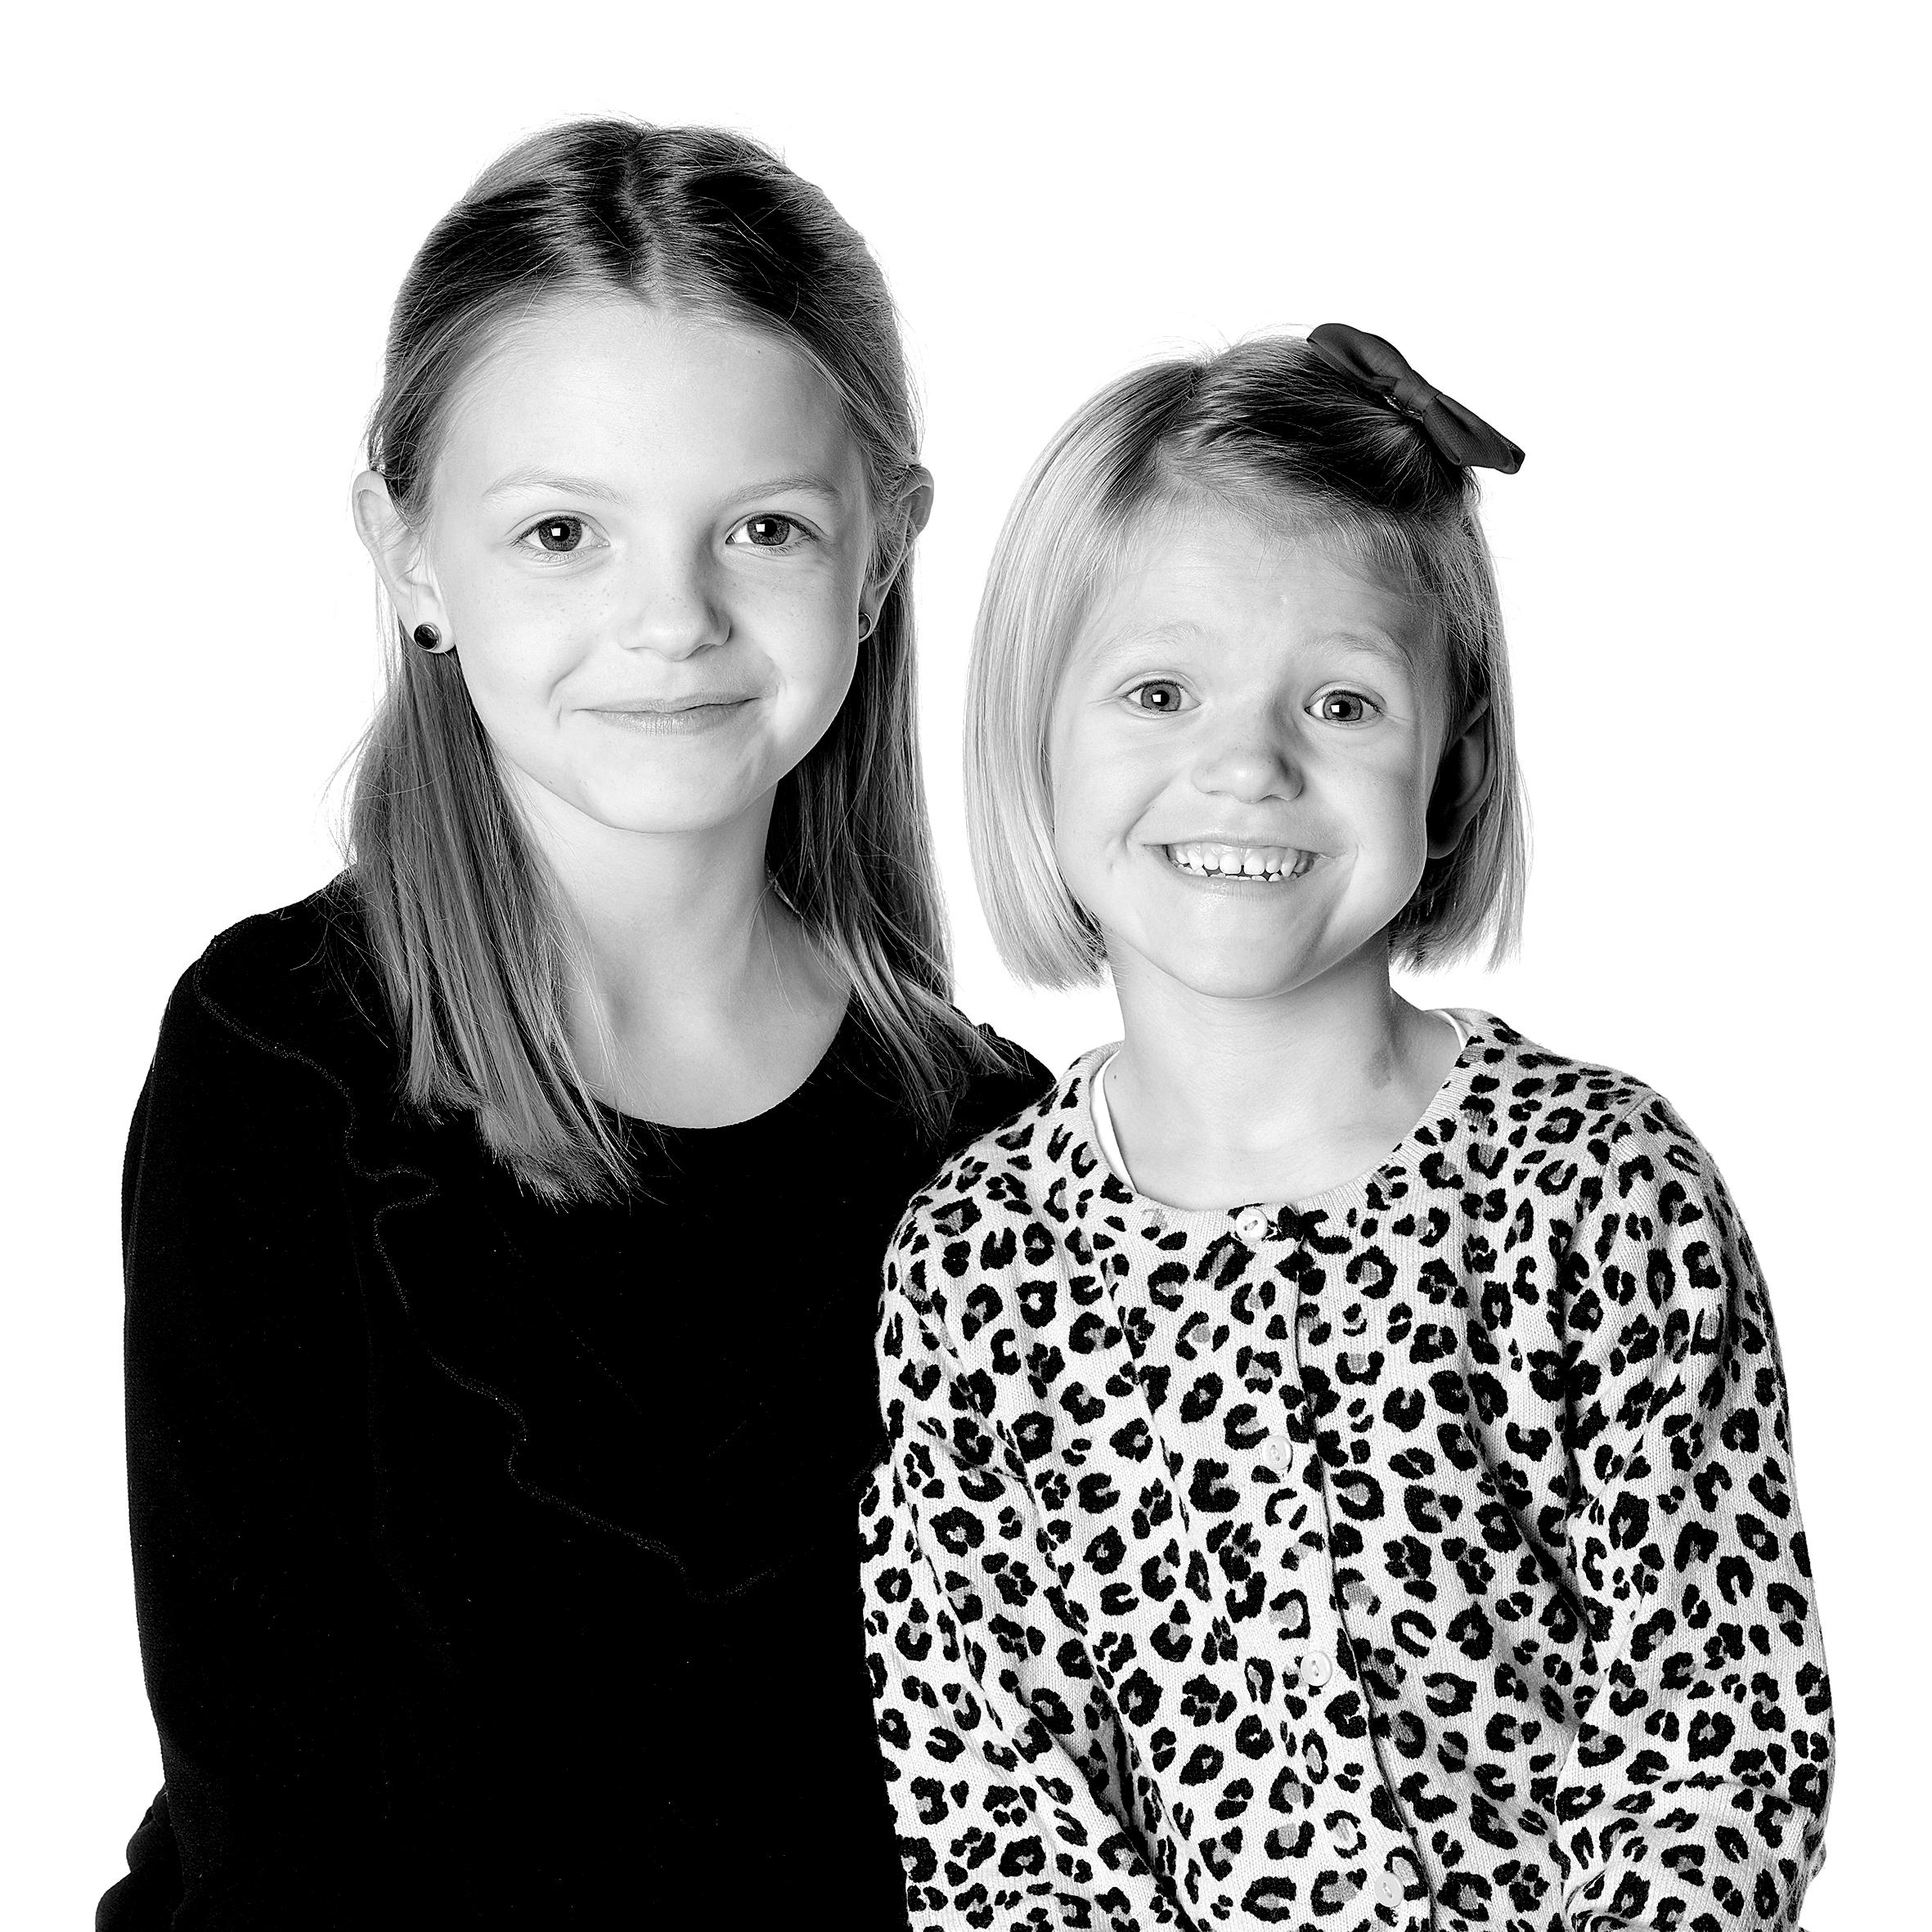 Søstre billede Aarhus